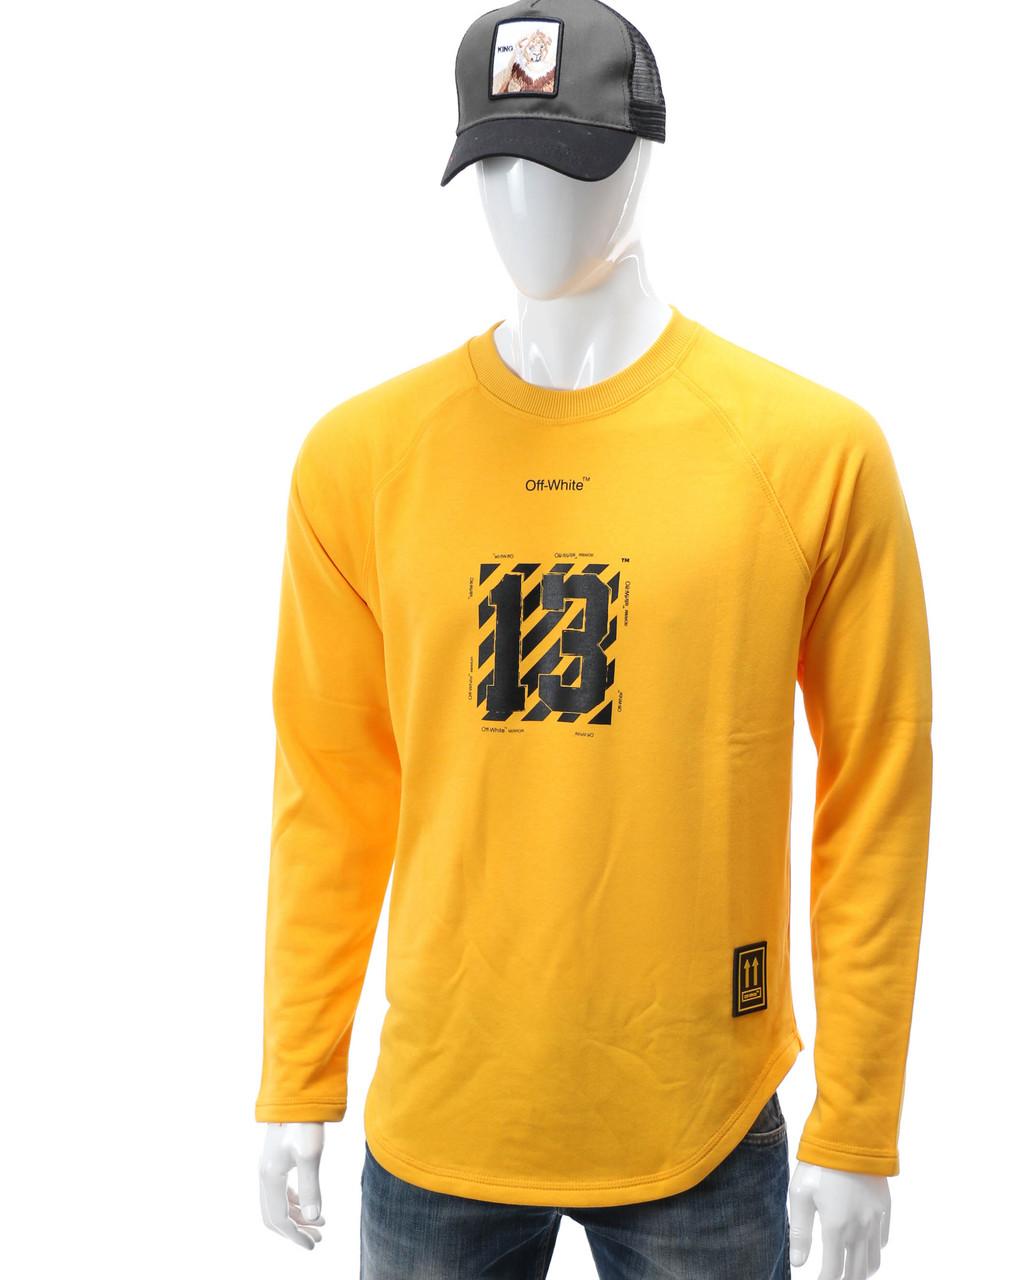 Свитшот желтый OFF-WHITE №13 Р-2 YEL L(Р) 19-503-201-001